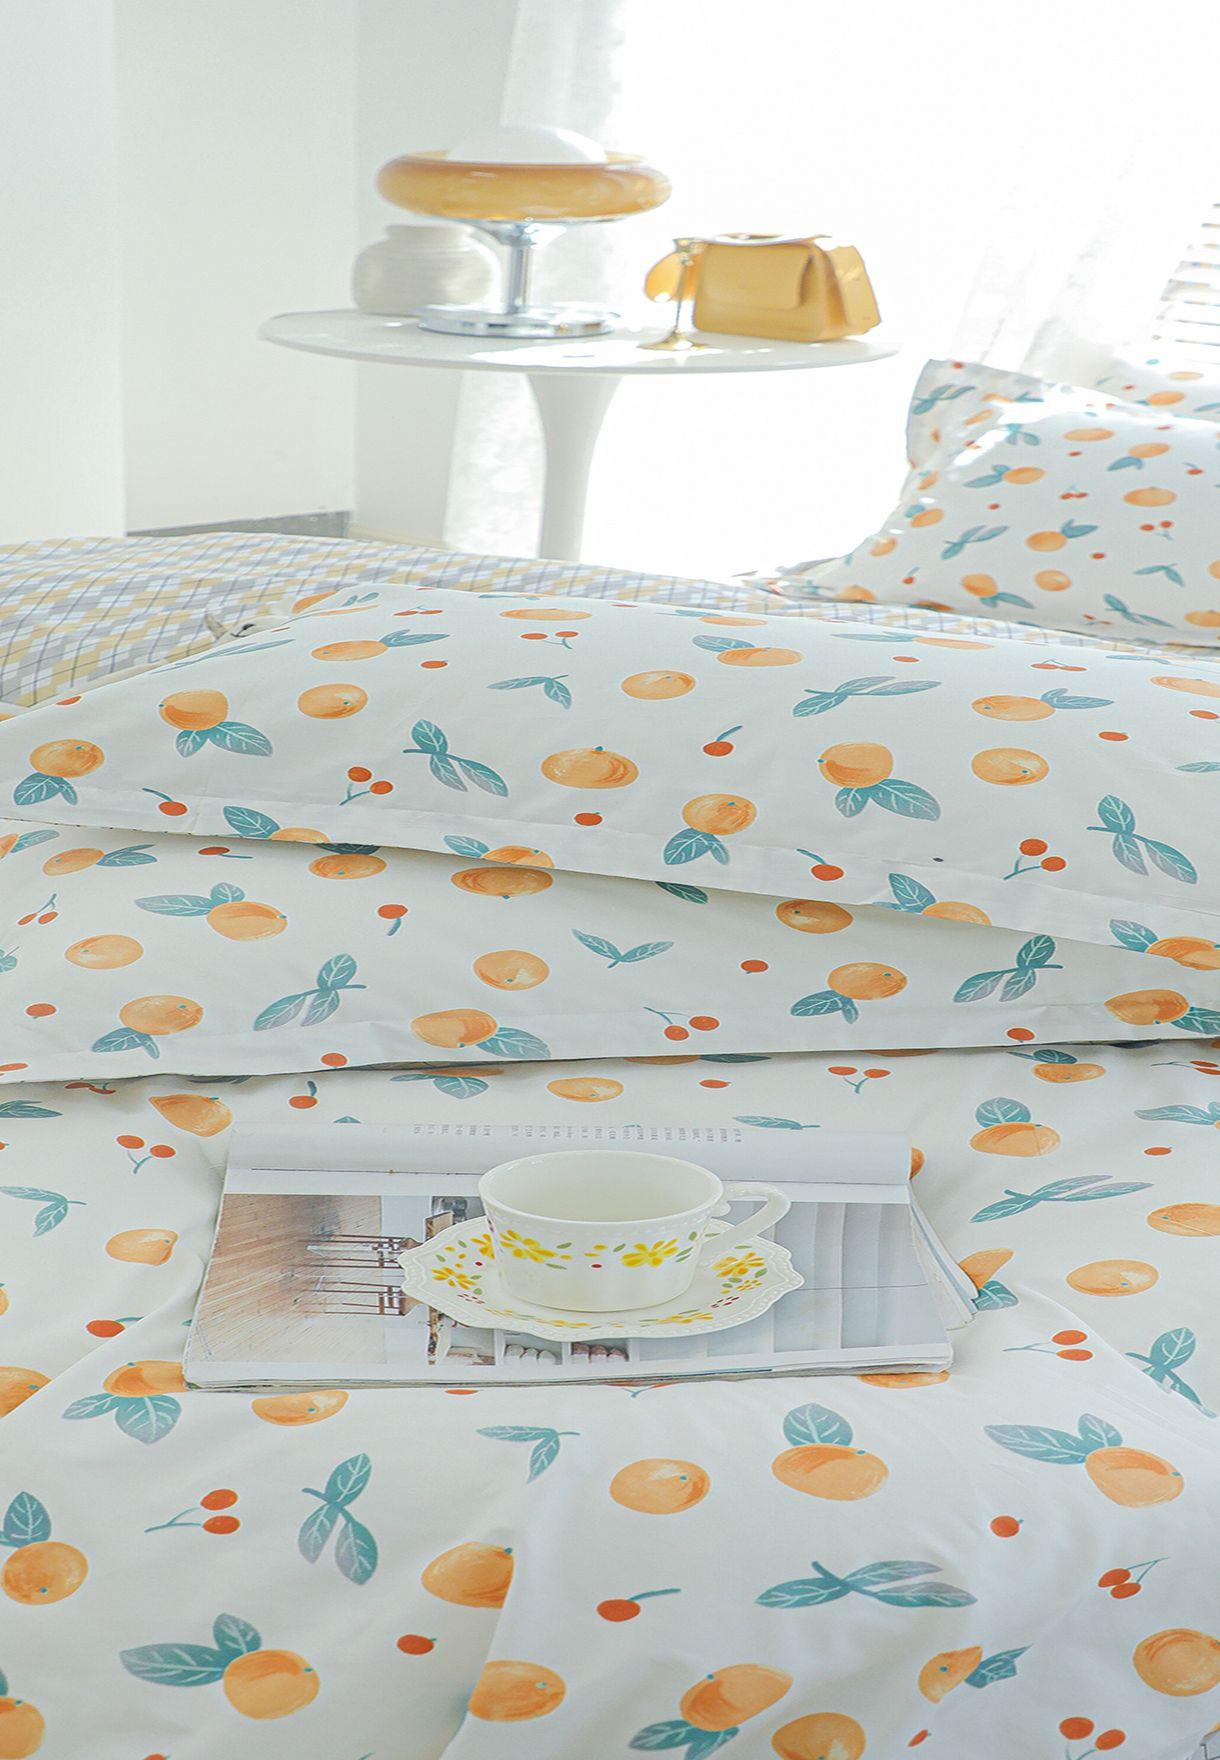 King Floral Print Bedding Set 200 X 230Cm